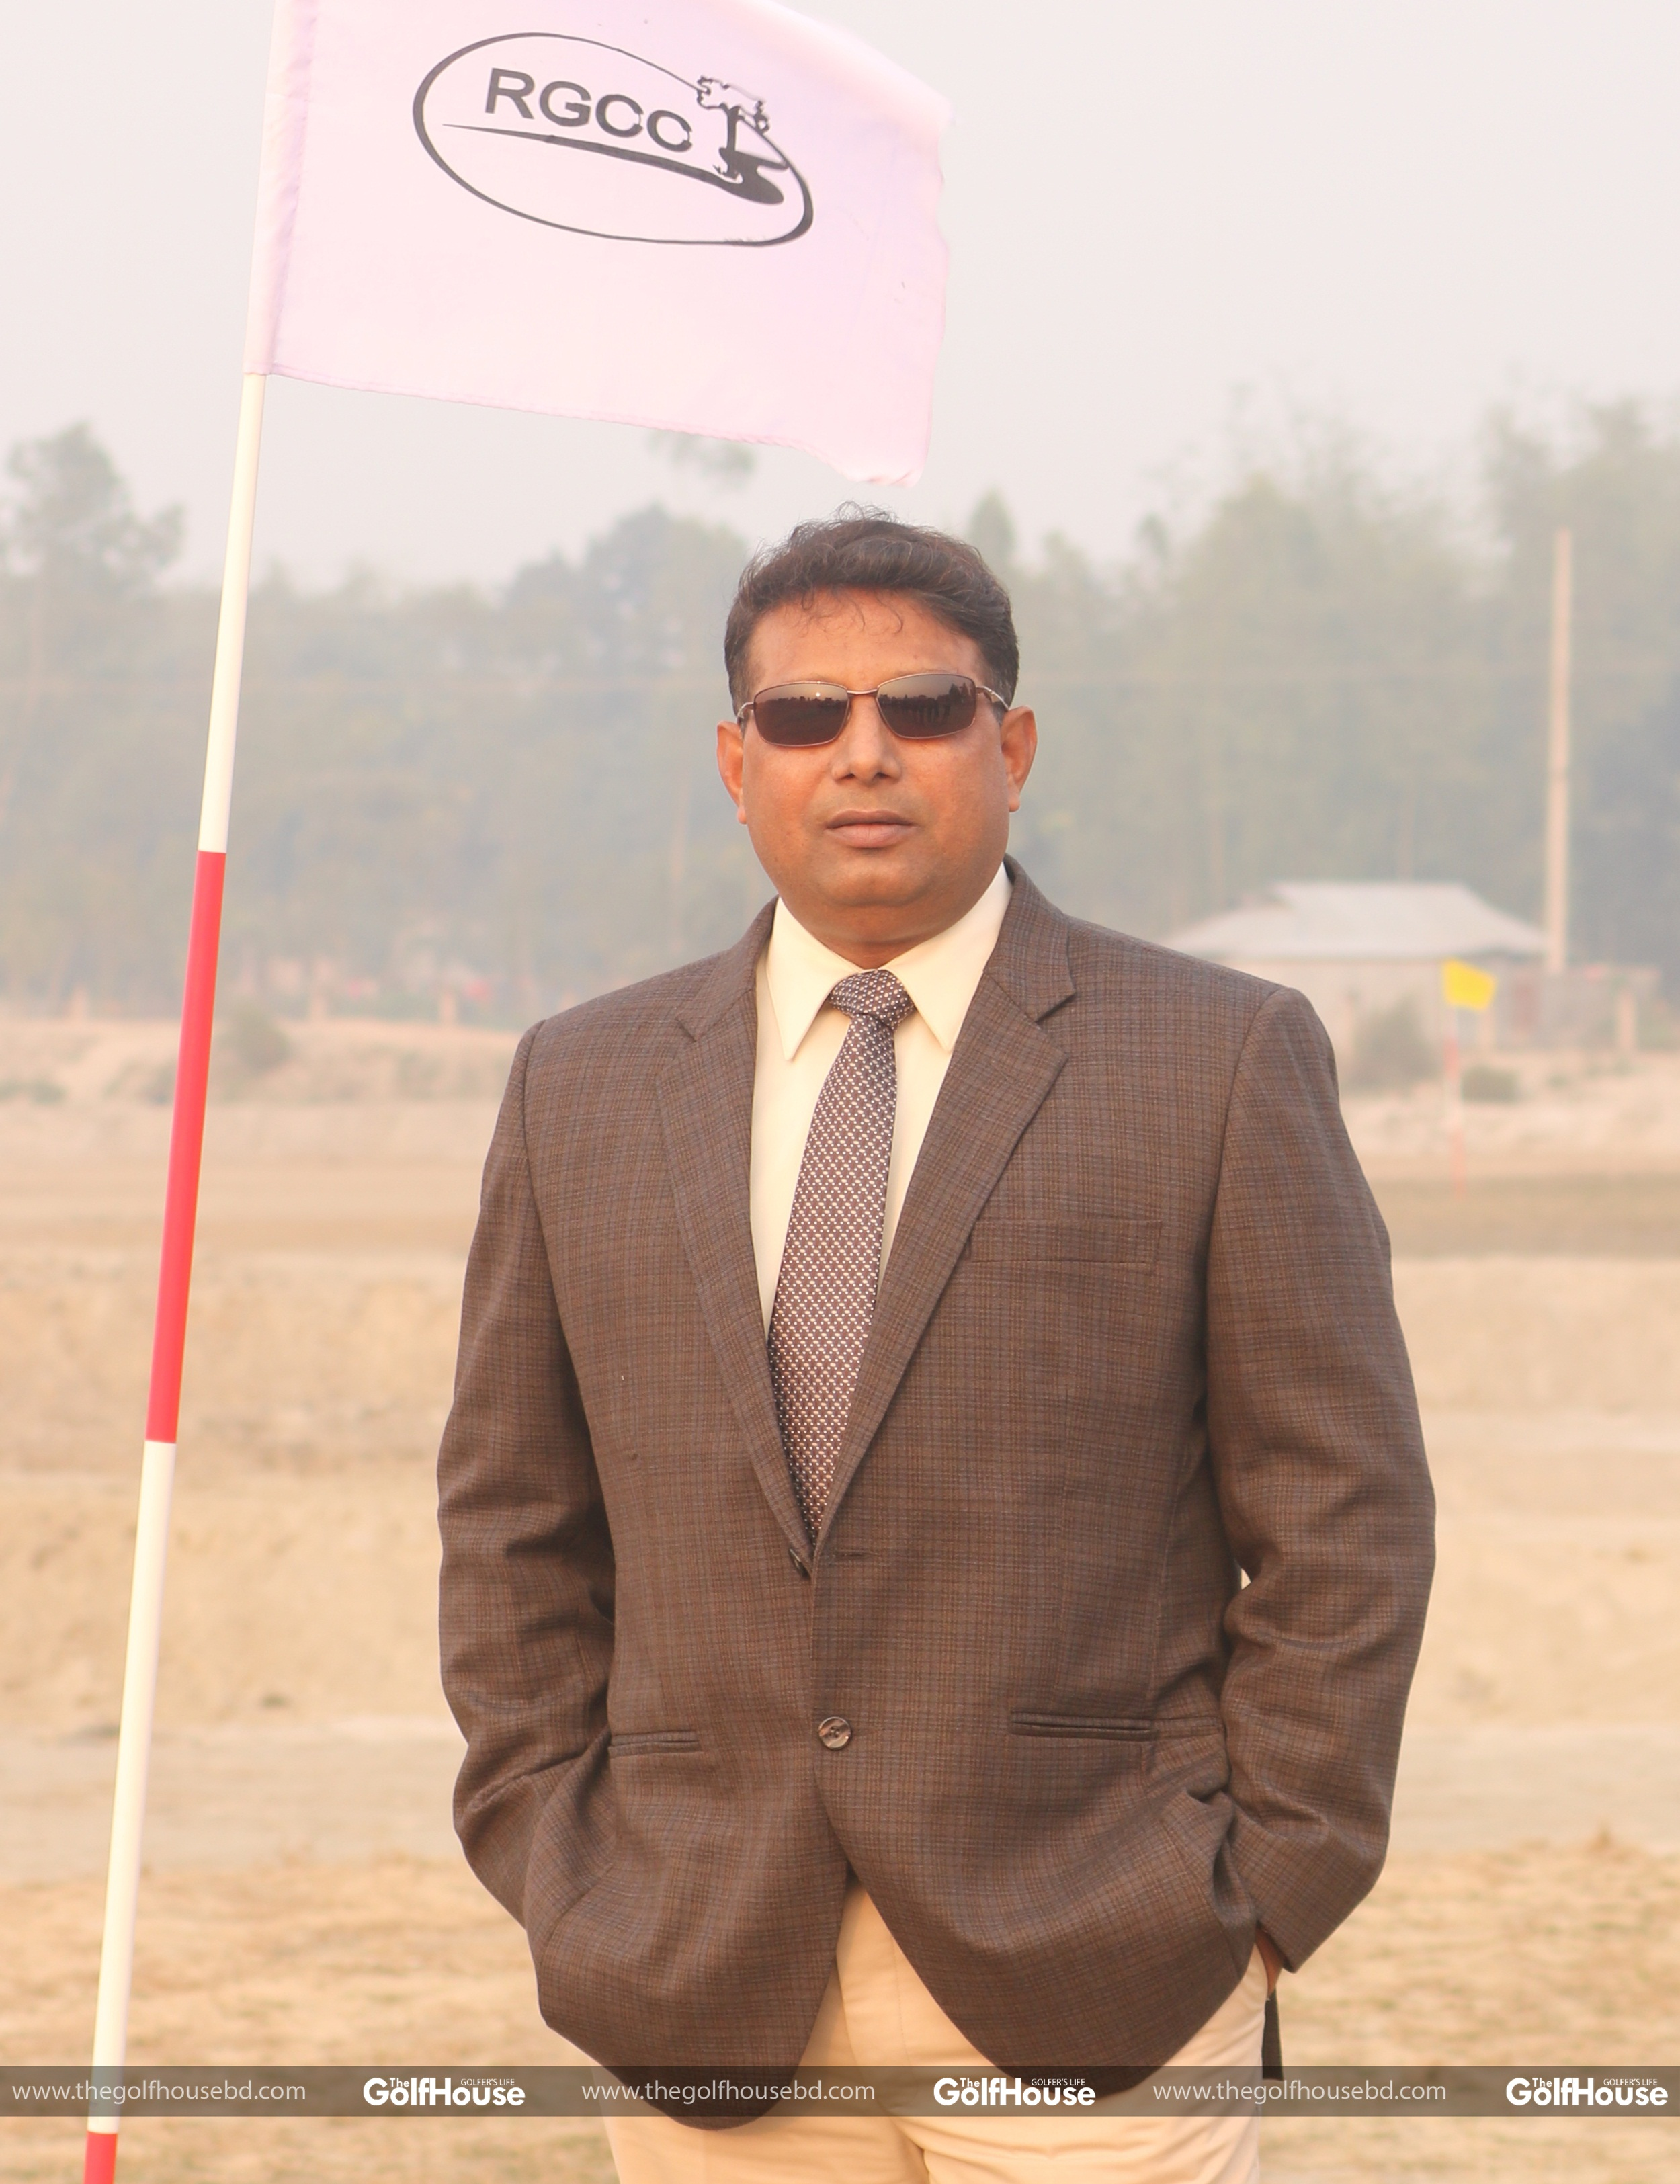 Major_General_Mashud_Razzaq_ndc,_afwc_psc_GOC_66_Division_Area_Commander_Rangpur_Area